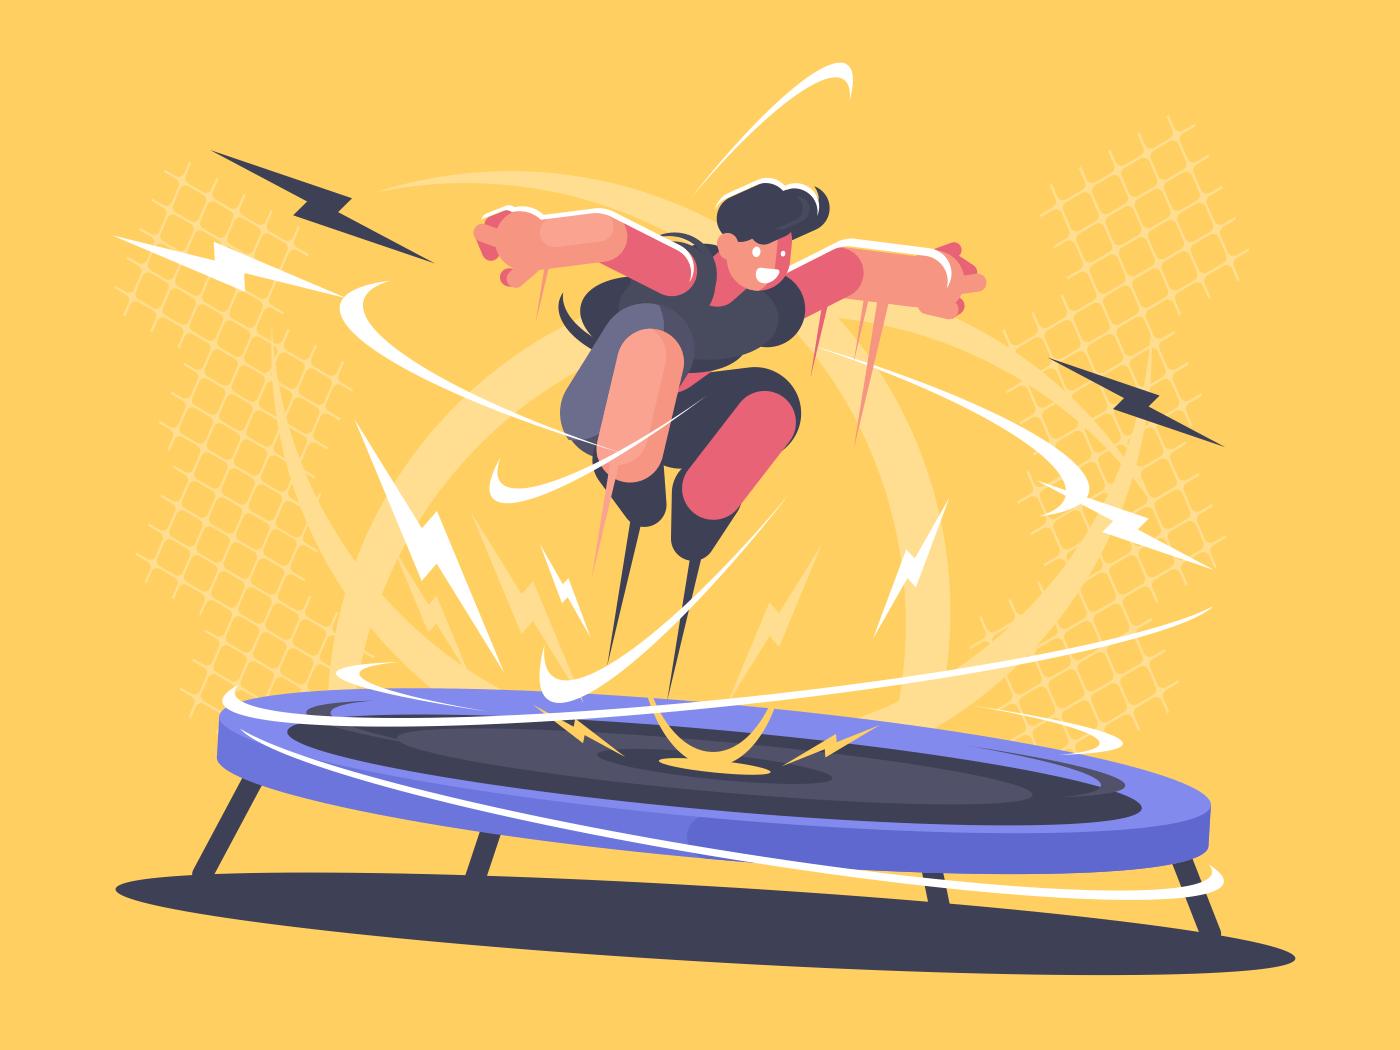 Athlete jumping on trampoline. Sports acrobatics training. Vector flat illustration